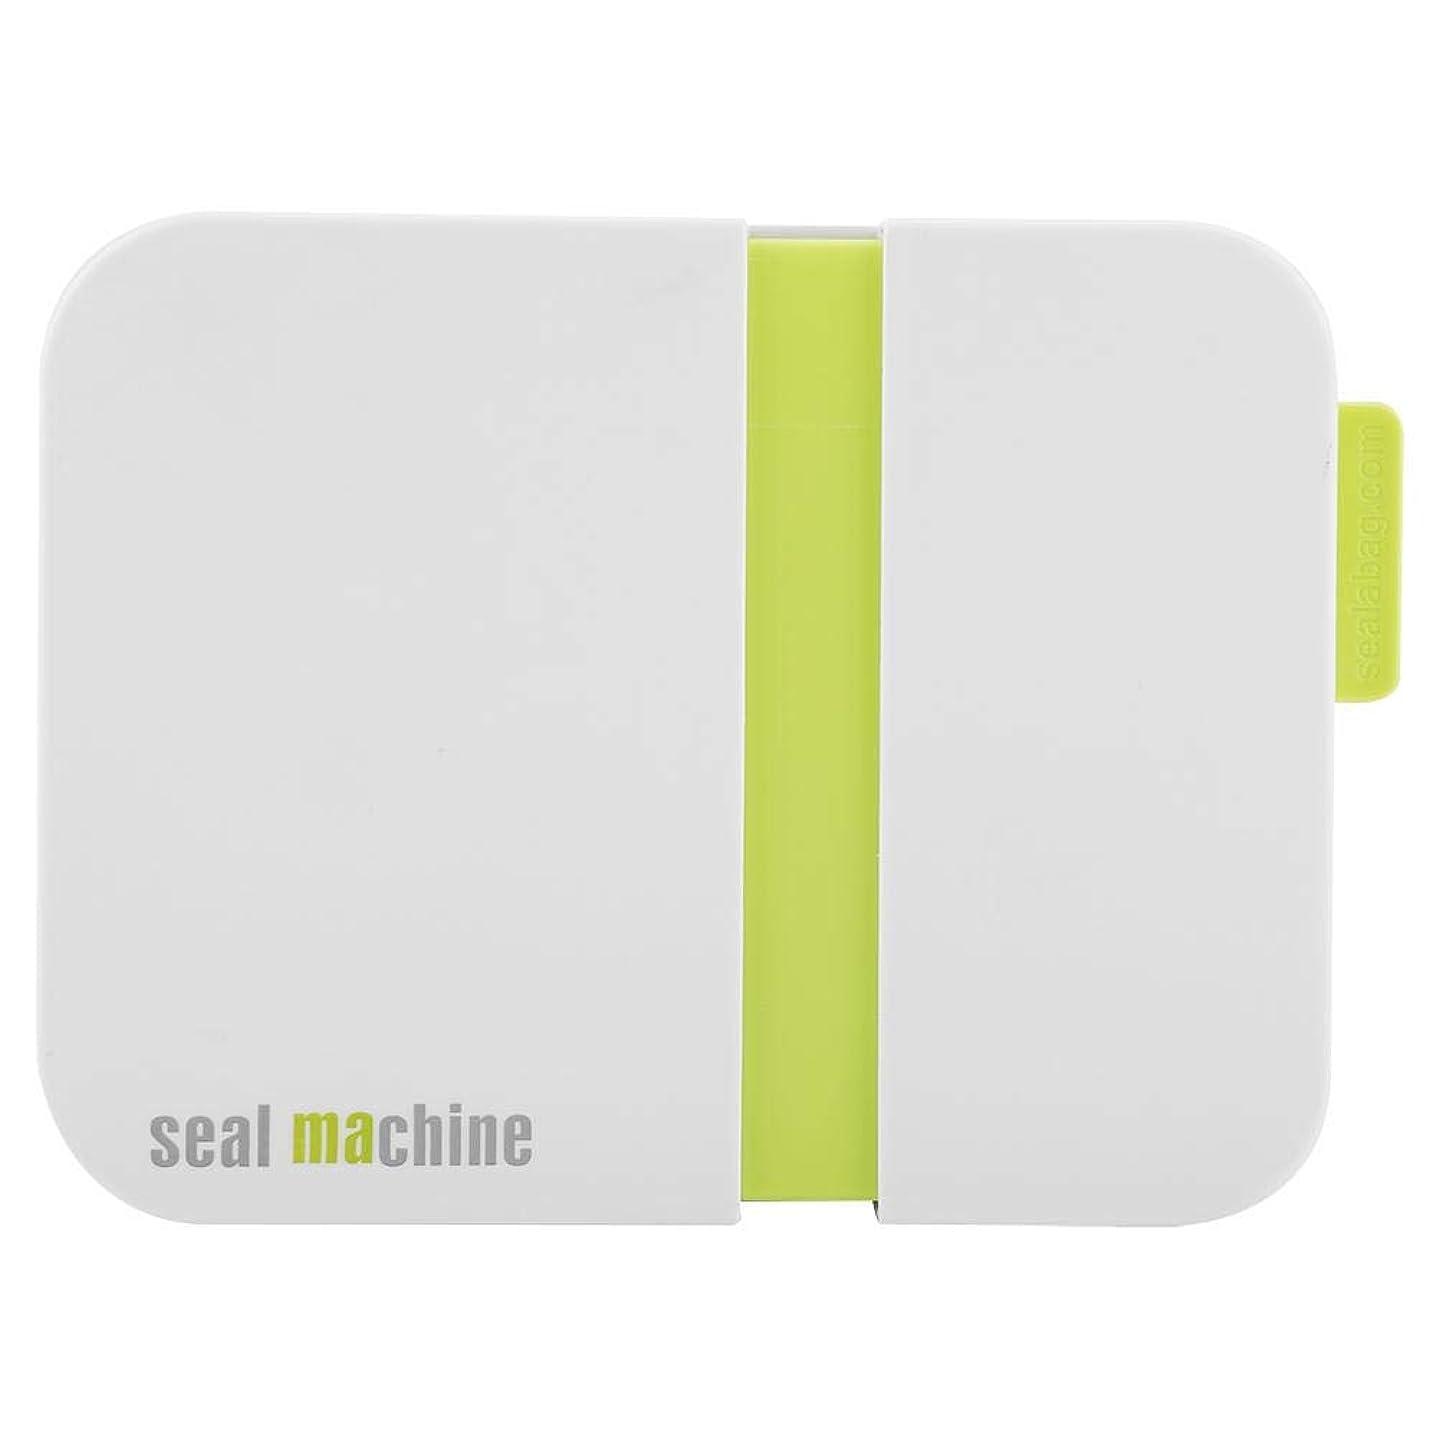 Bag Sealer, Fixable Household Portable Bag Sealer Food Sealing Machine Kitchen Tool